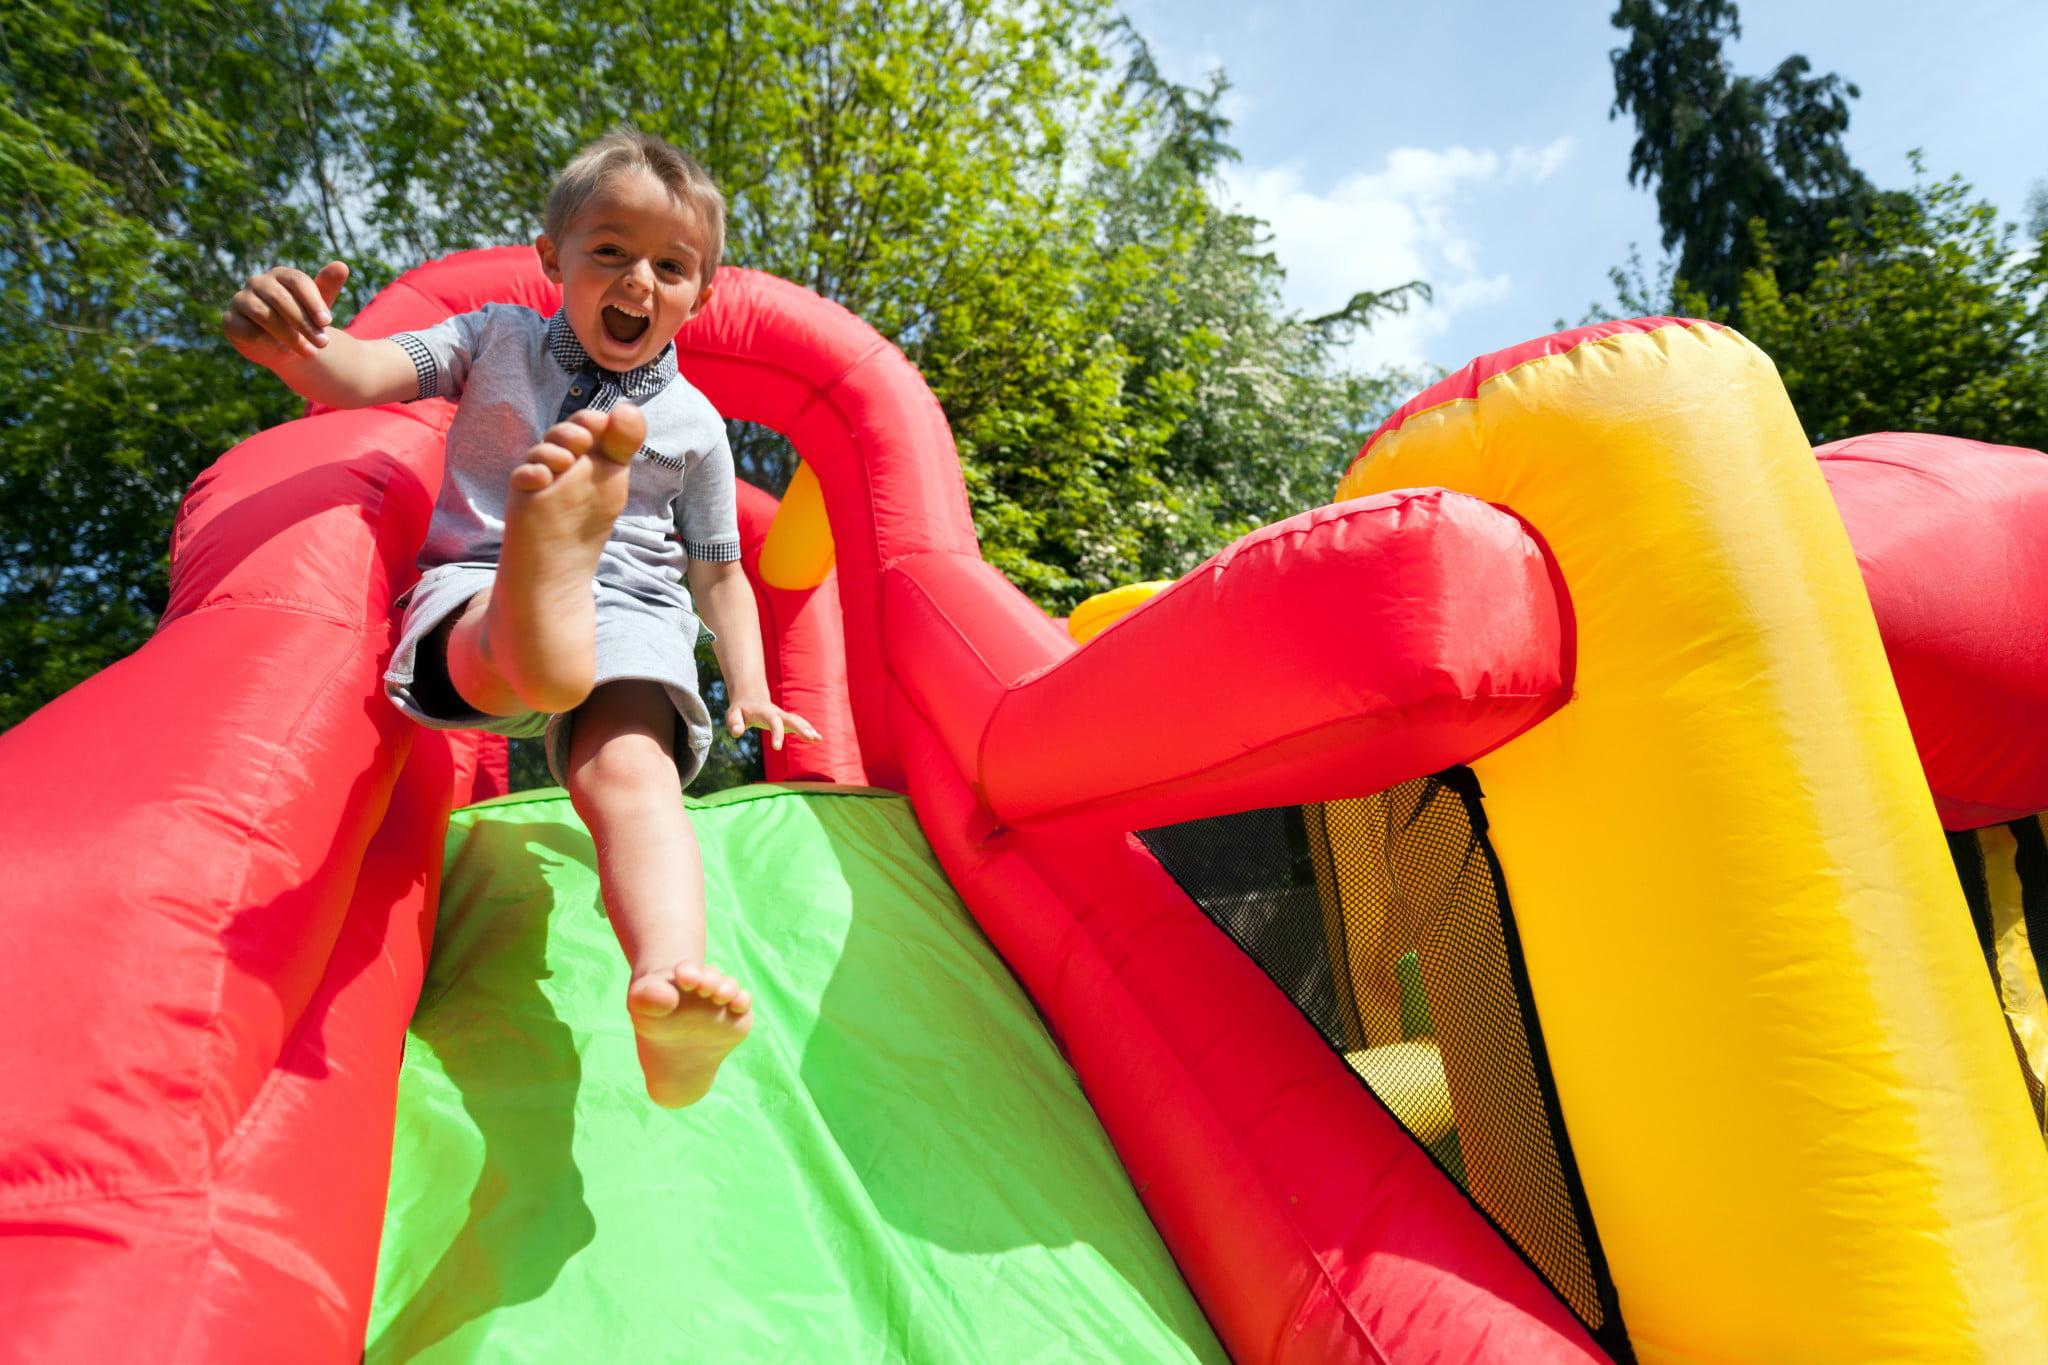 Heart Foundation: little boy sliding down bouncy castle ramp